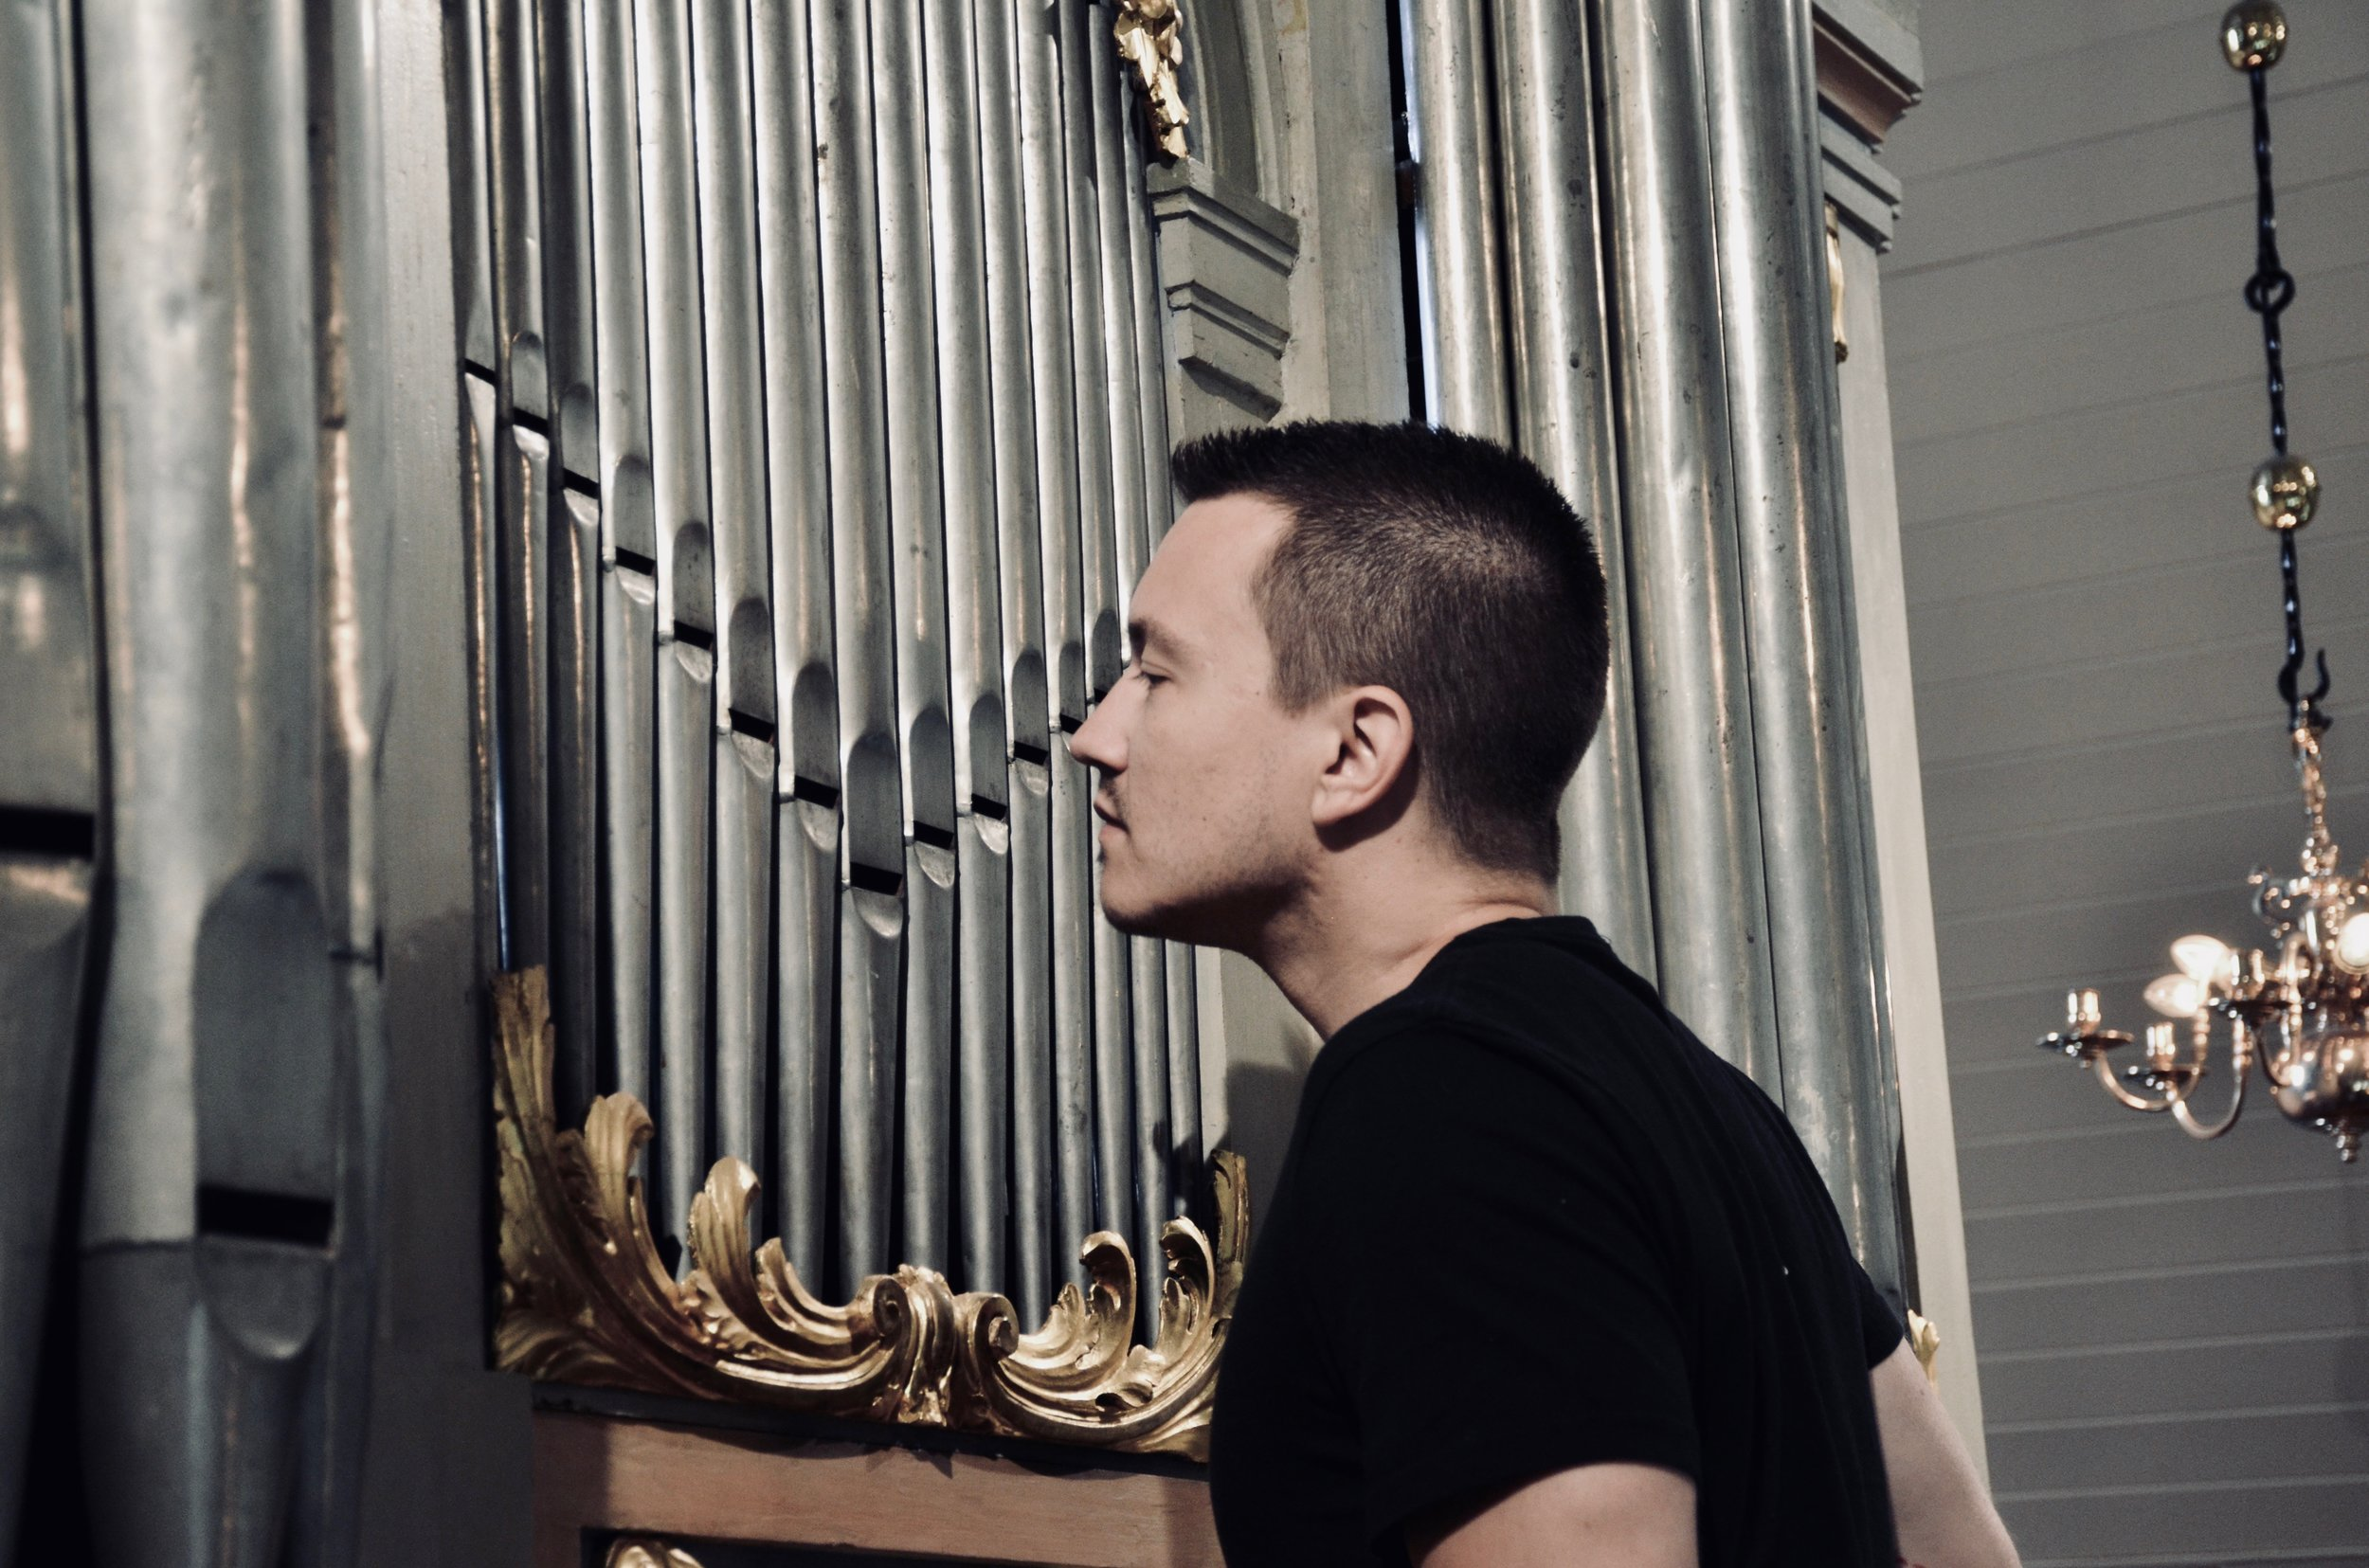 Corey De Tar examines the pipe construction of the 1783 Schiörlin organ in Jonsered, Sweden.